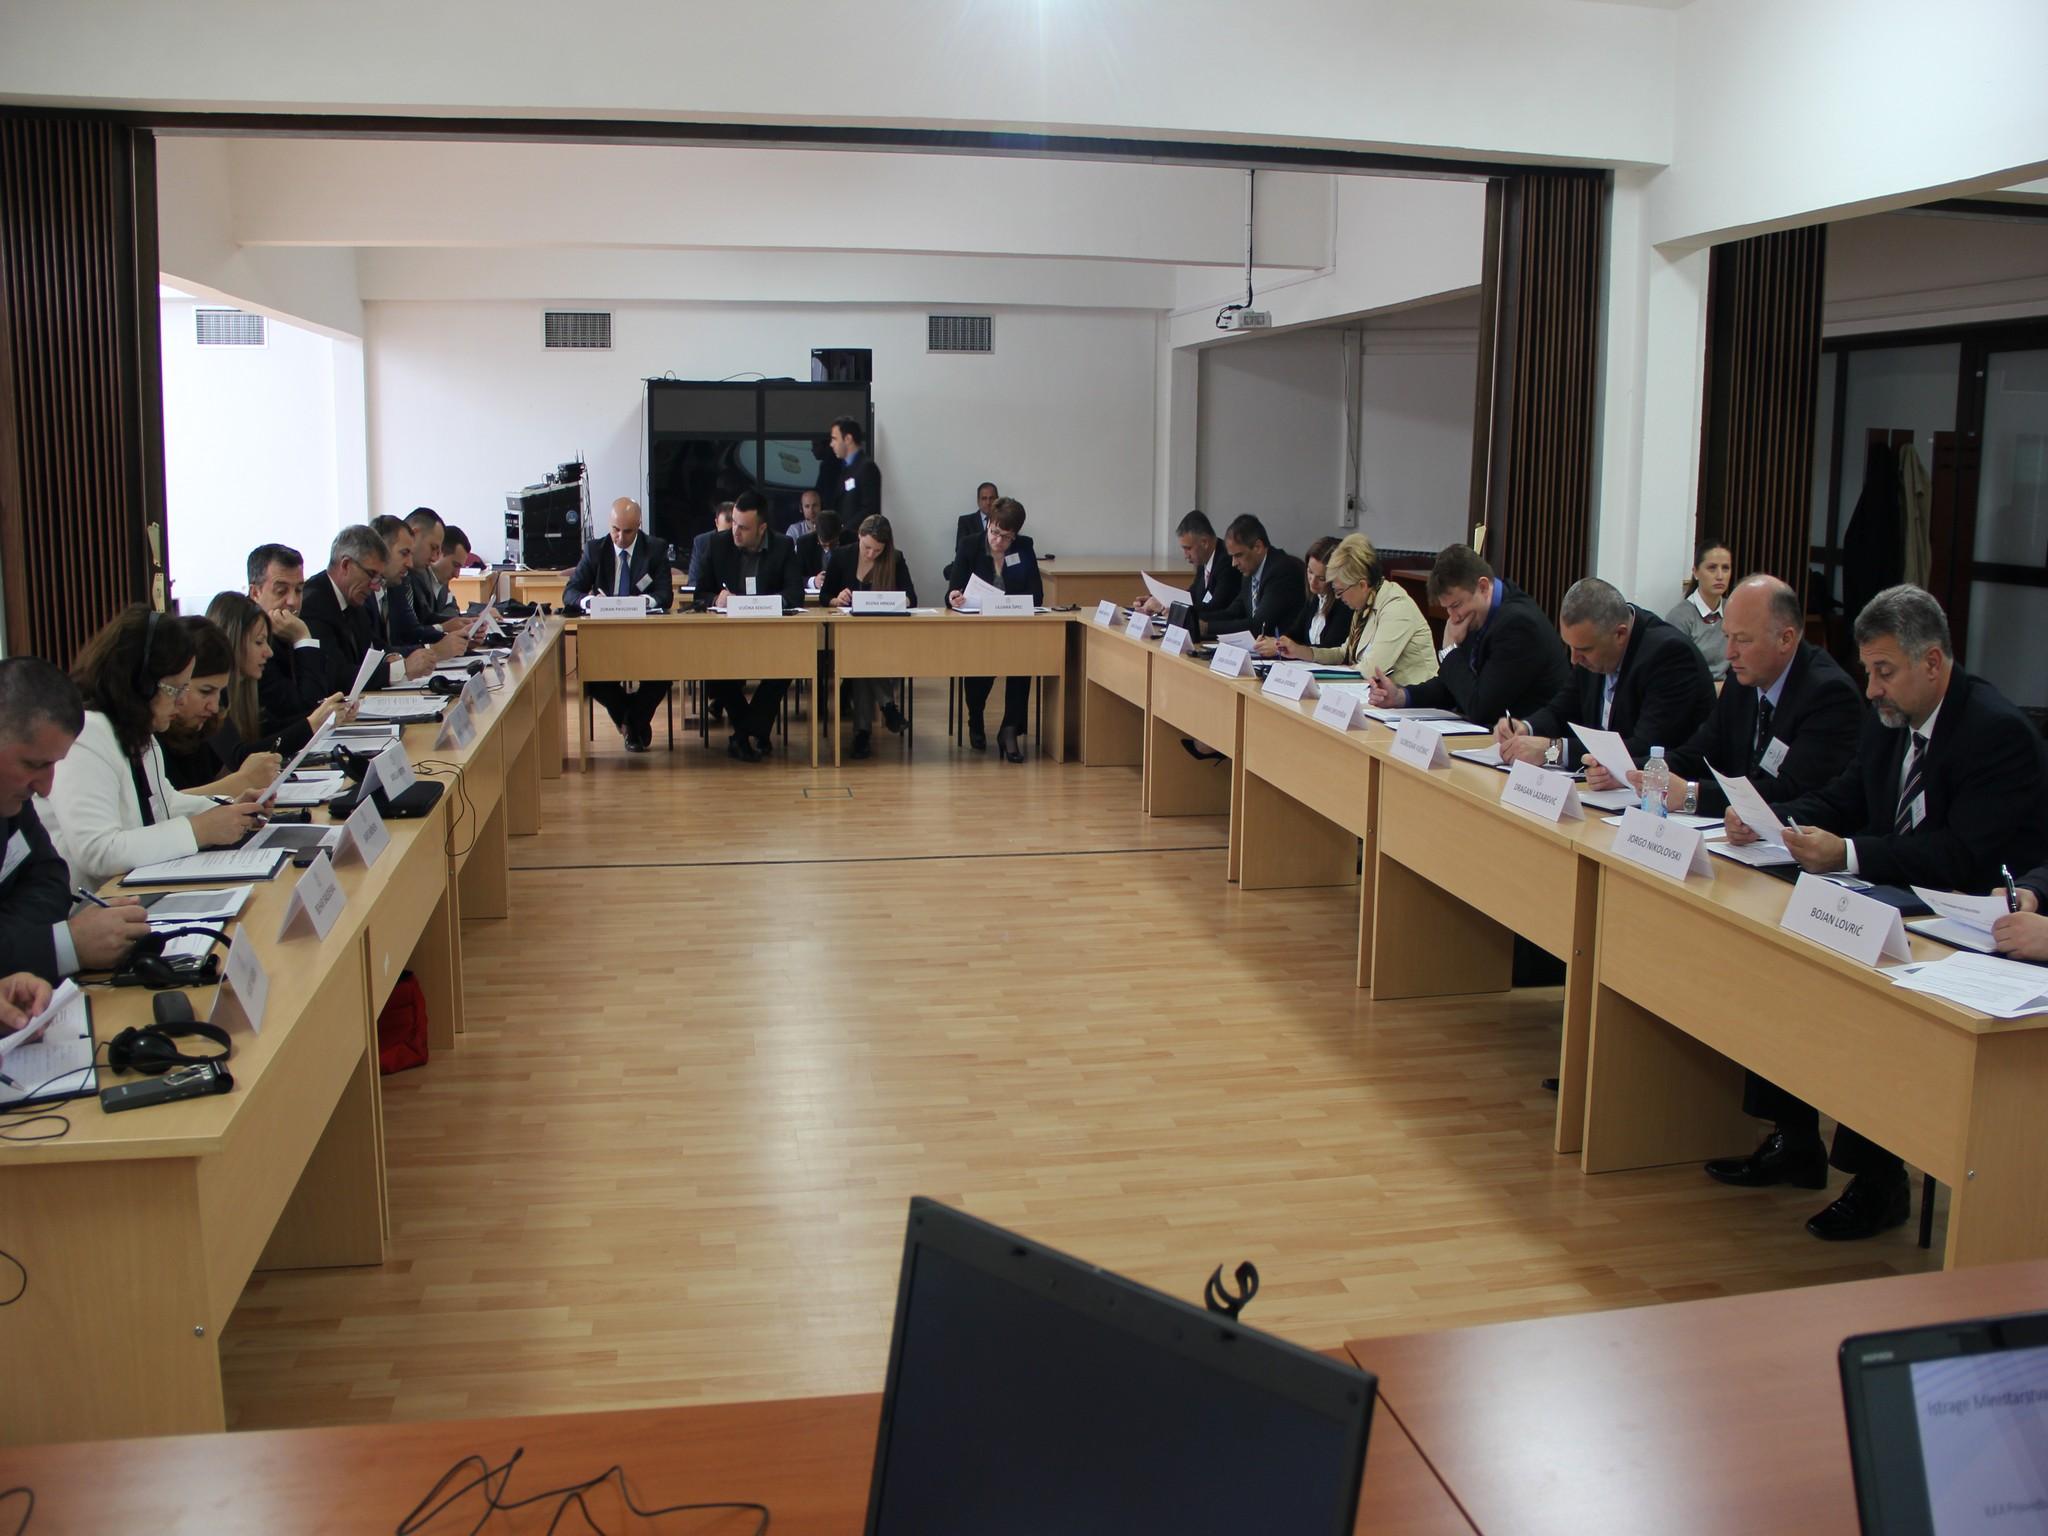 U Zagrebu održan regionalni trening na temu migracija, NVO Atina